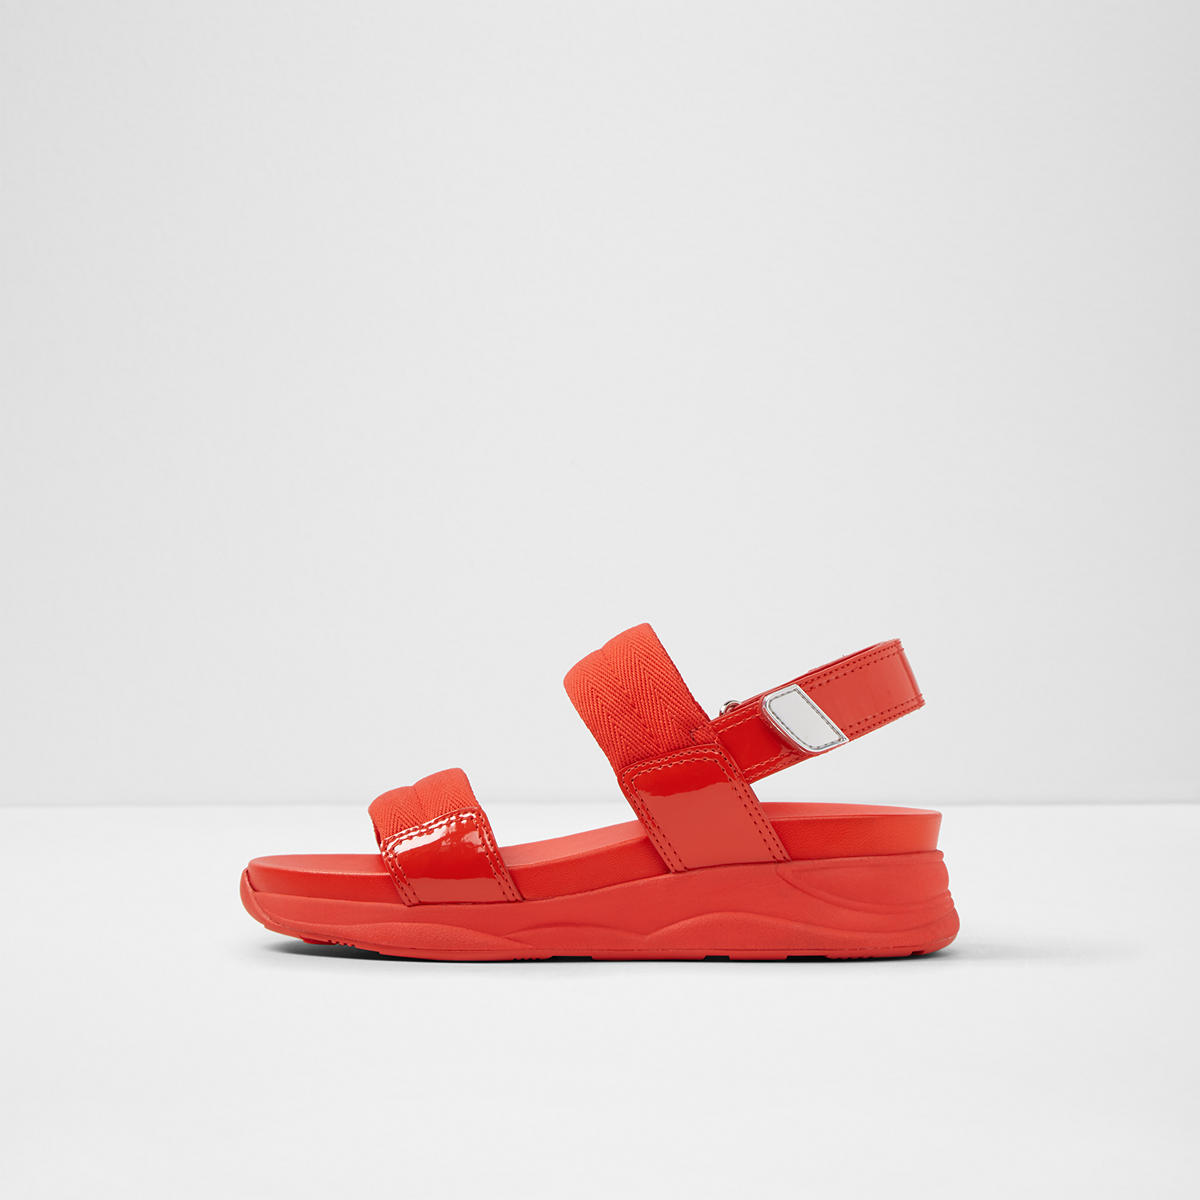 225c8c0465c Eloima Orange Women s Sandals